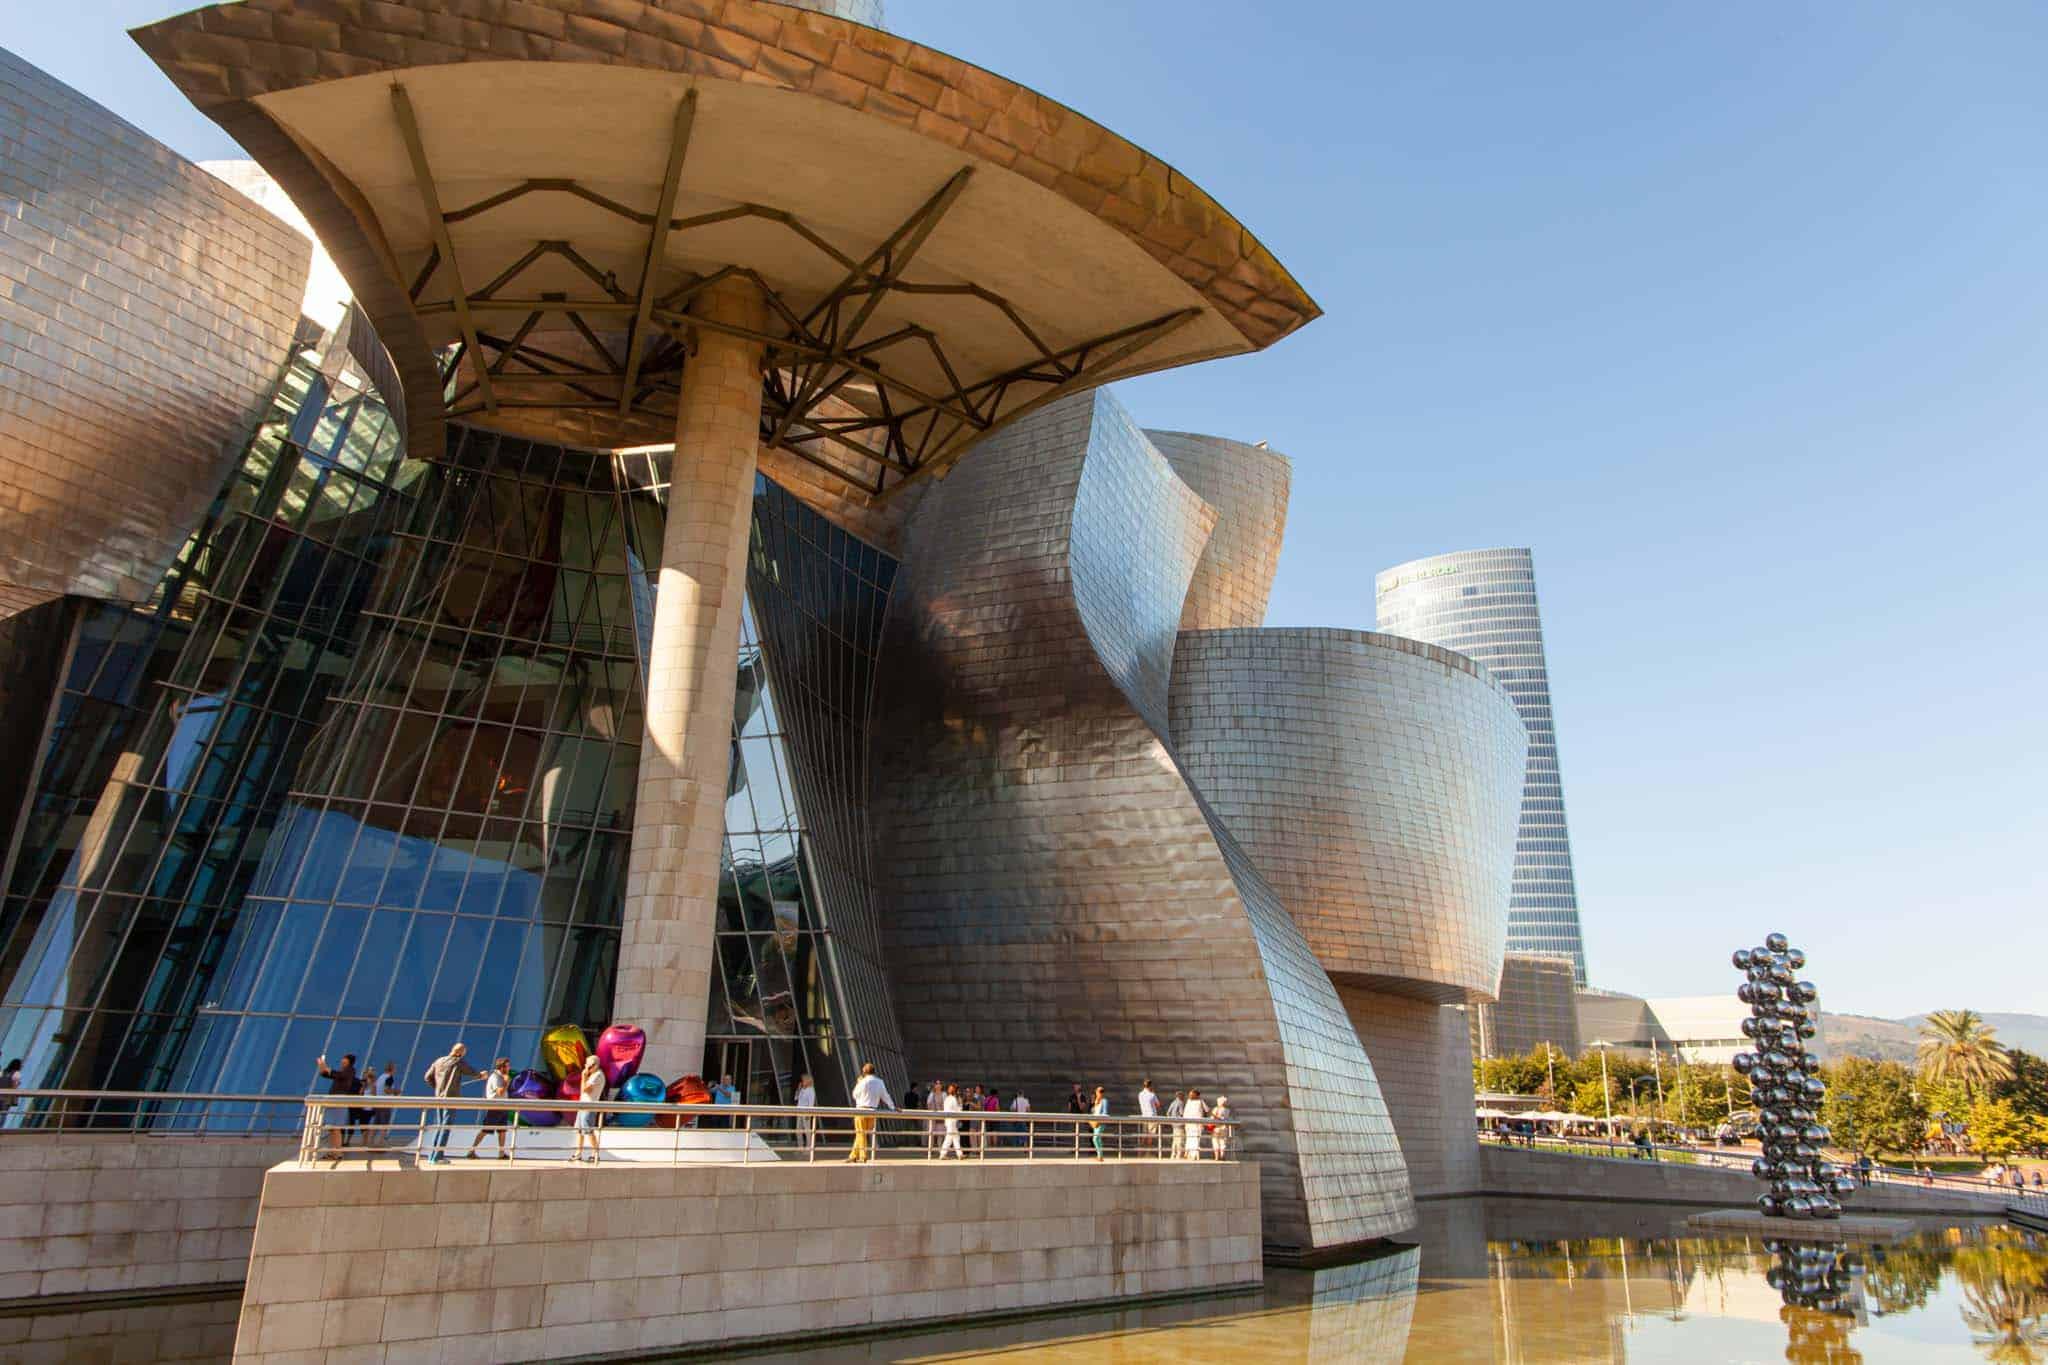 The modern looking Guggenheim museum in Bilbao Gu